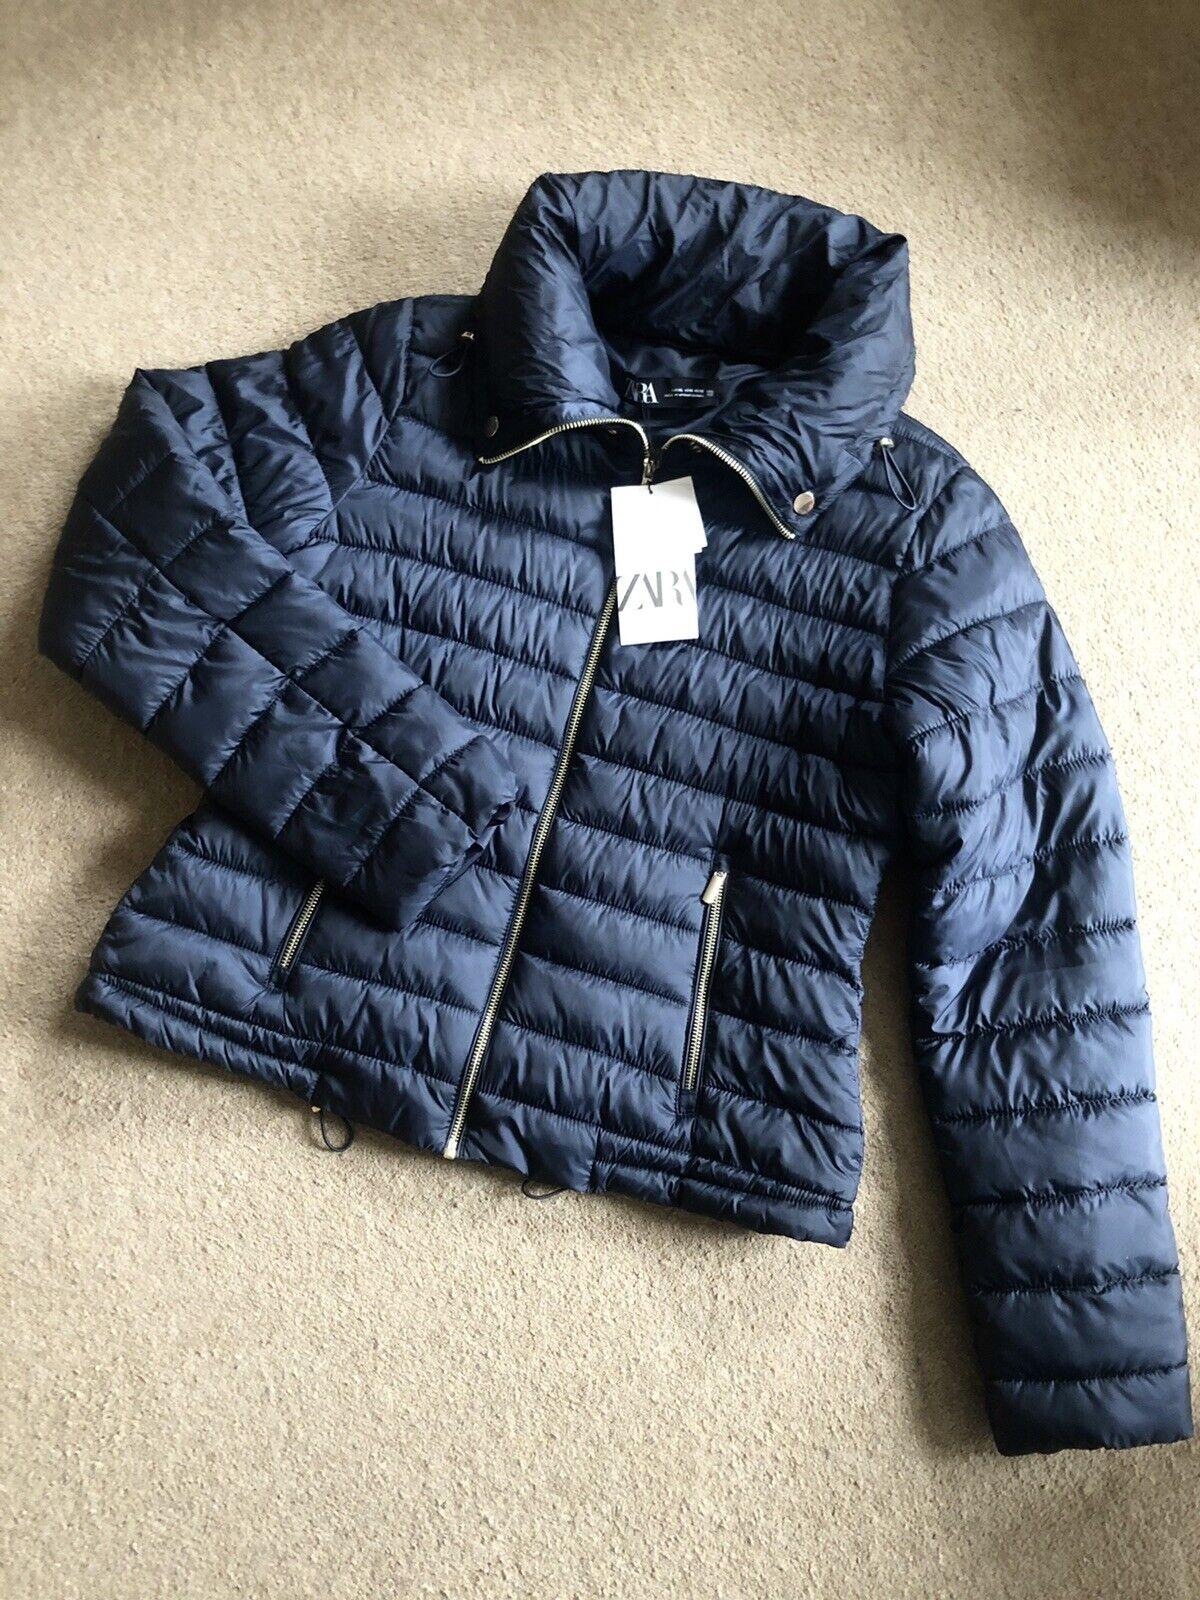 Zara Navy Water Resistant High Collar Puffer Jacket Coat XL UK16 # P28XL